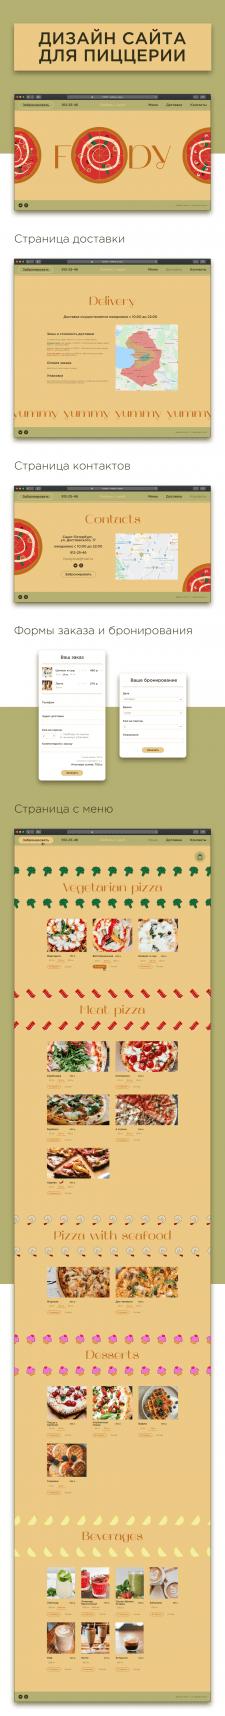 Дизайн сайта для пиццерии FOODY